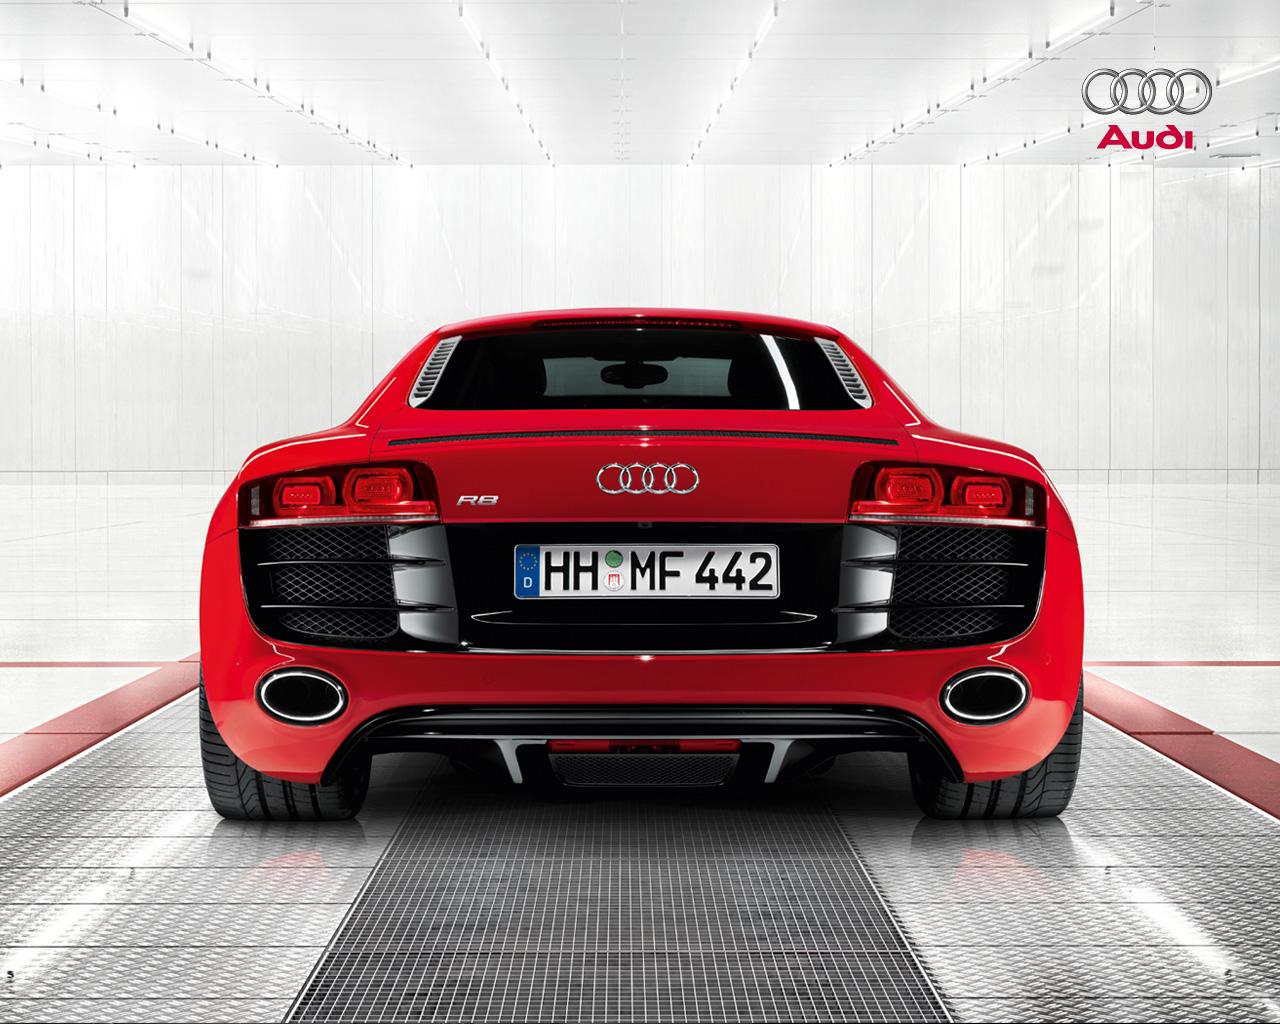 Download 1920x1200 pix car photo - buick, regal, car, machinery, cars